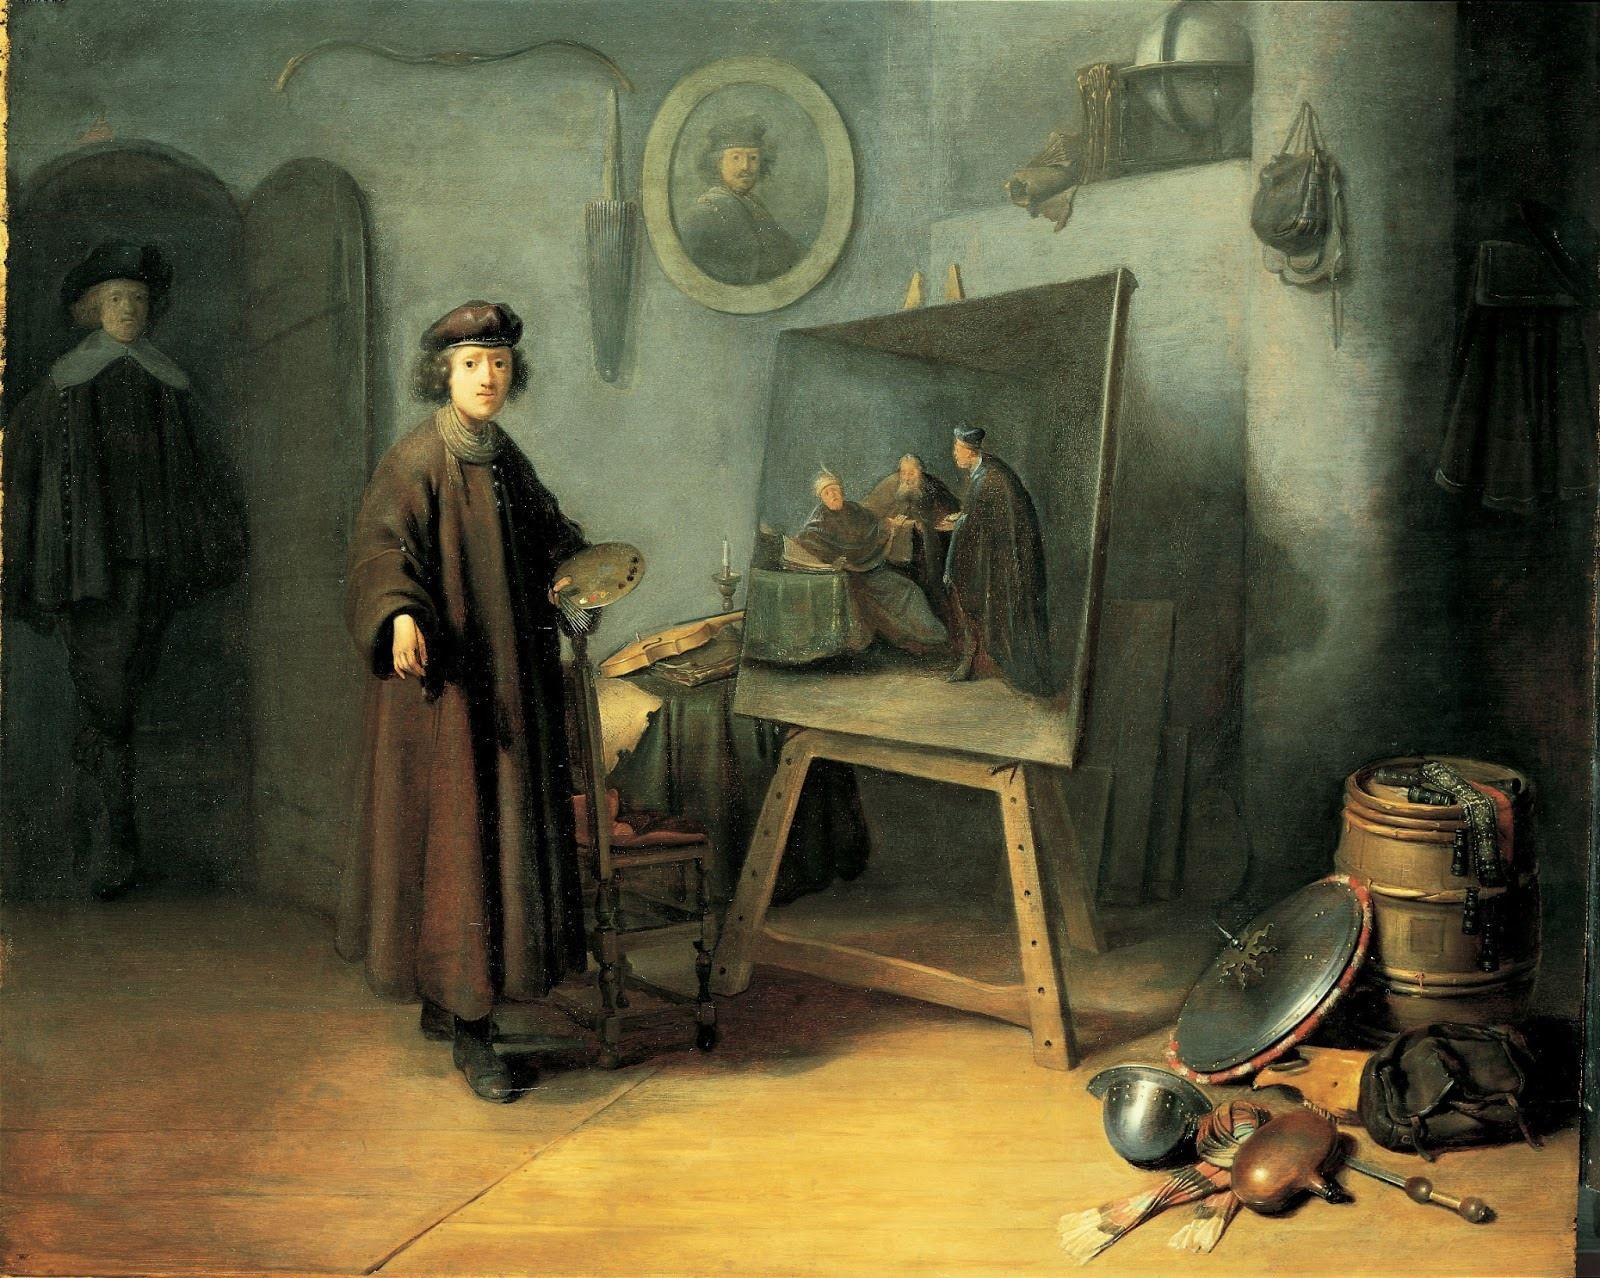 Gerrit Dou: A painter in his studio, c. 1628. Dou was Rembrandt's